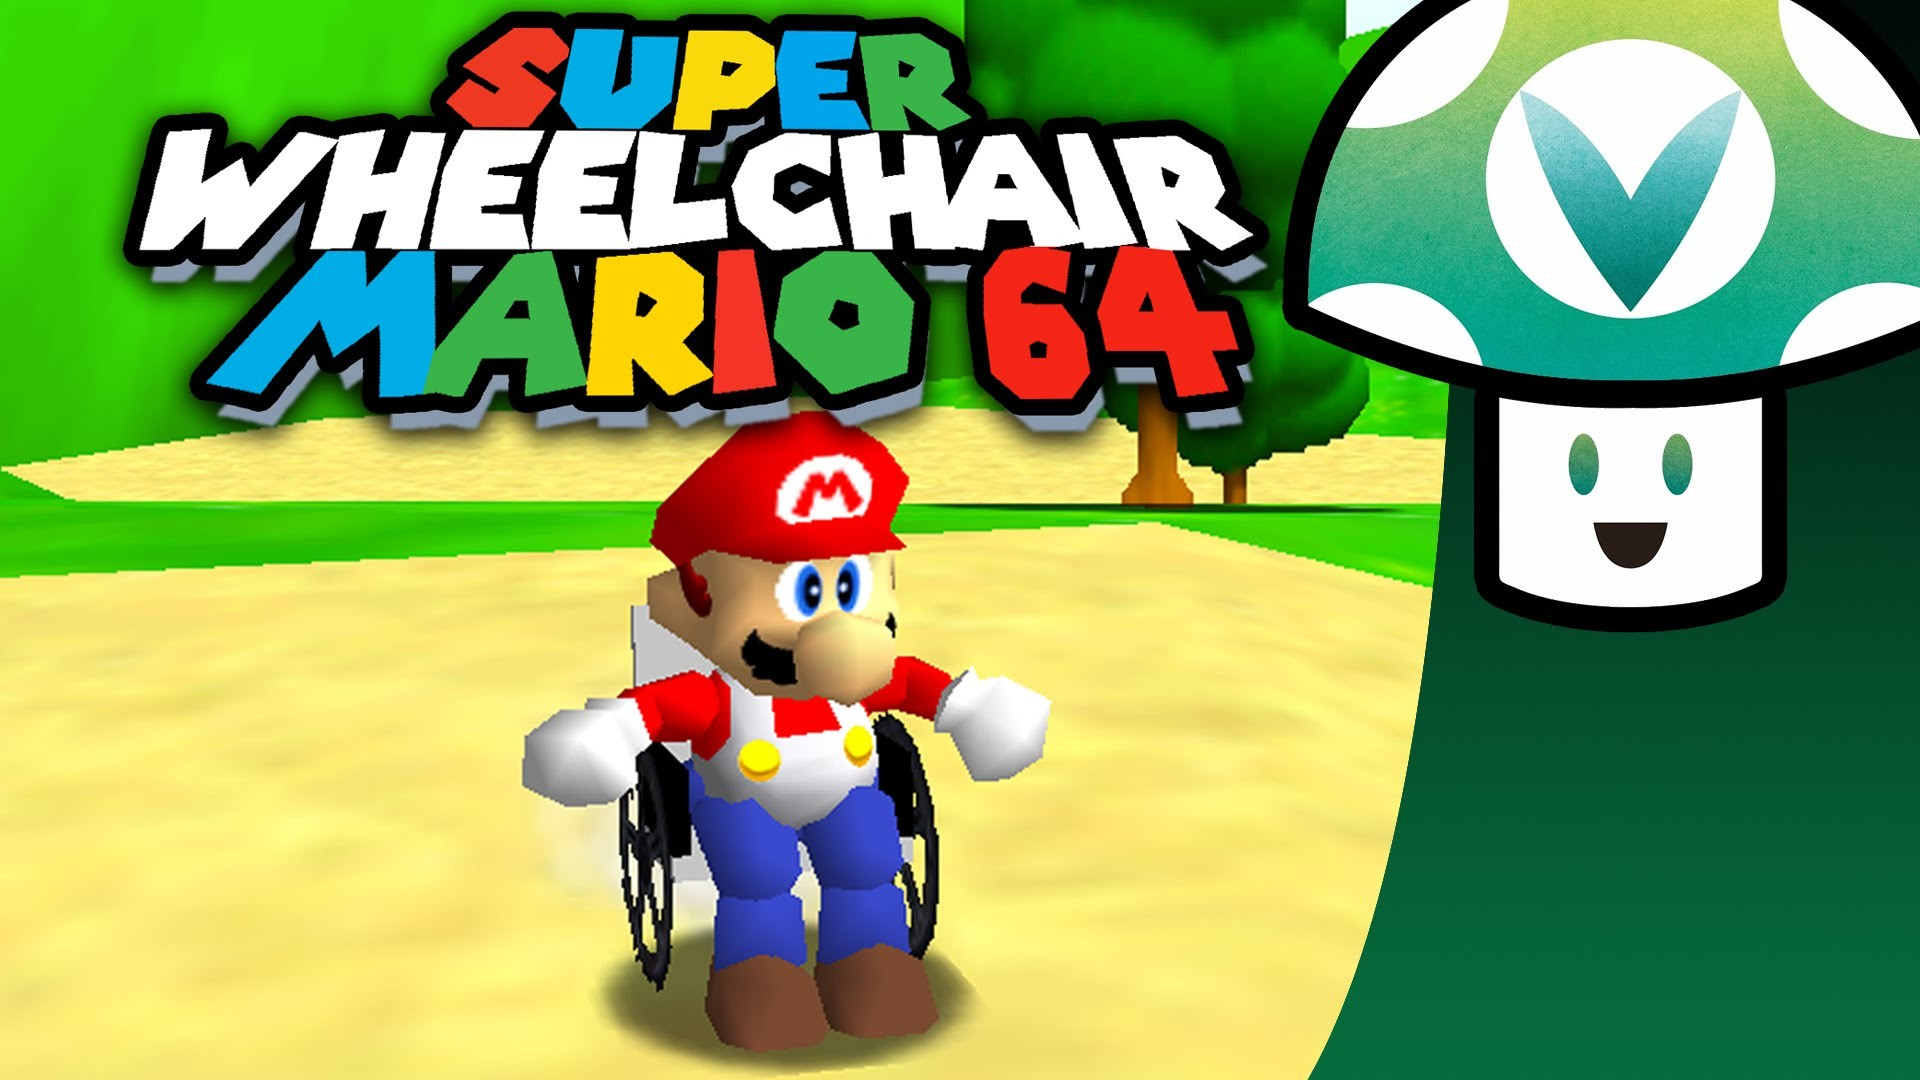 [Vinesauce] Joel – Super Wheelchair Mario 64 – YouTube